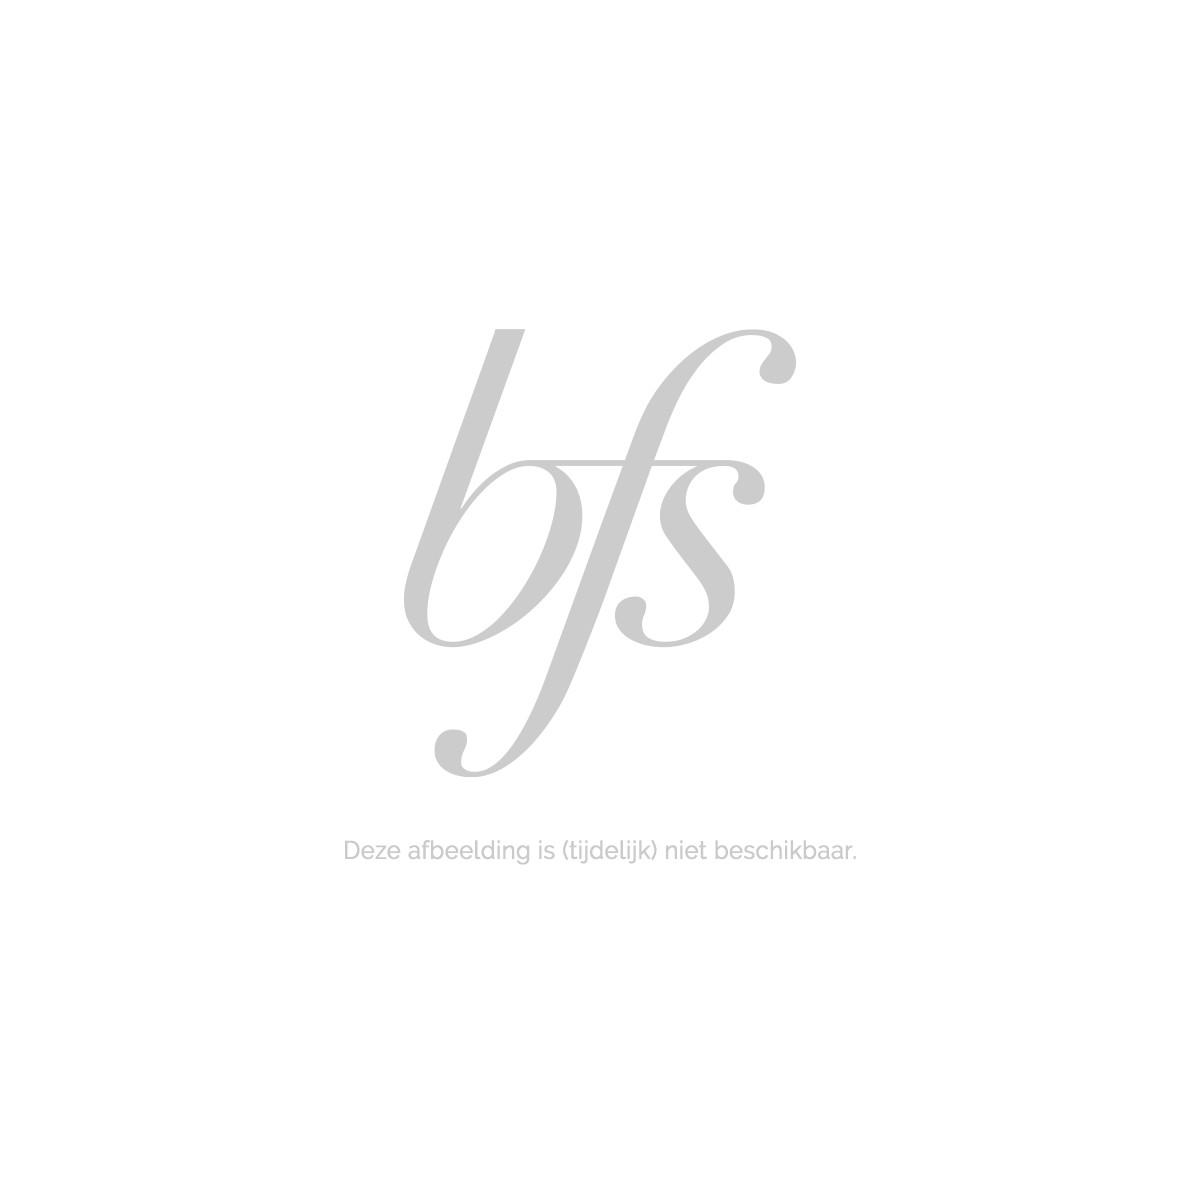 Bemineral Brush Anti Blemish Smudge Beautyfashionshop